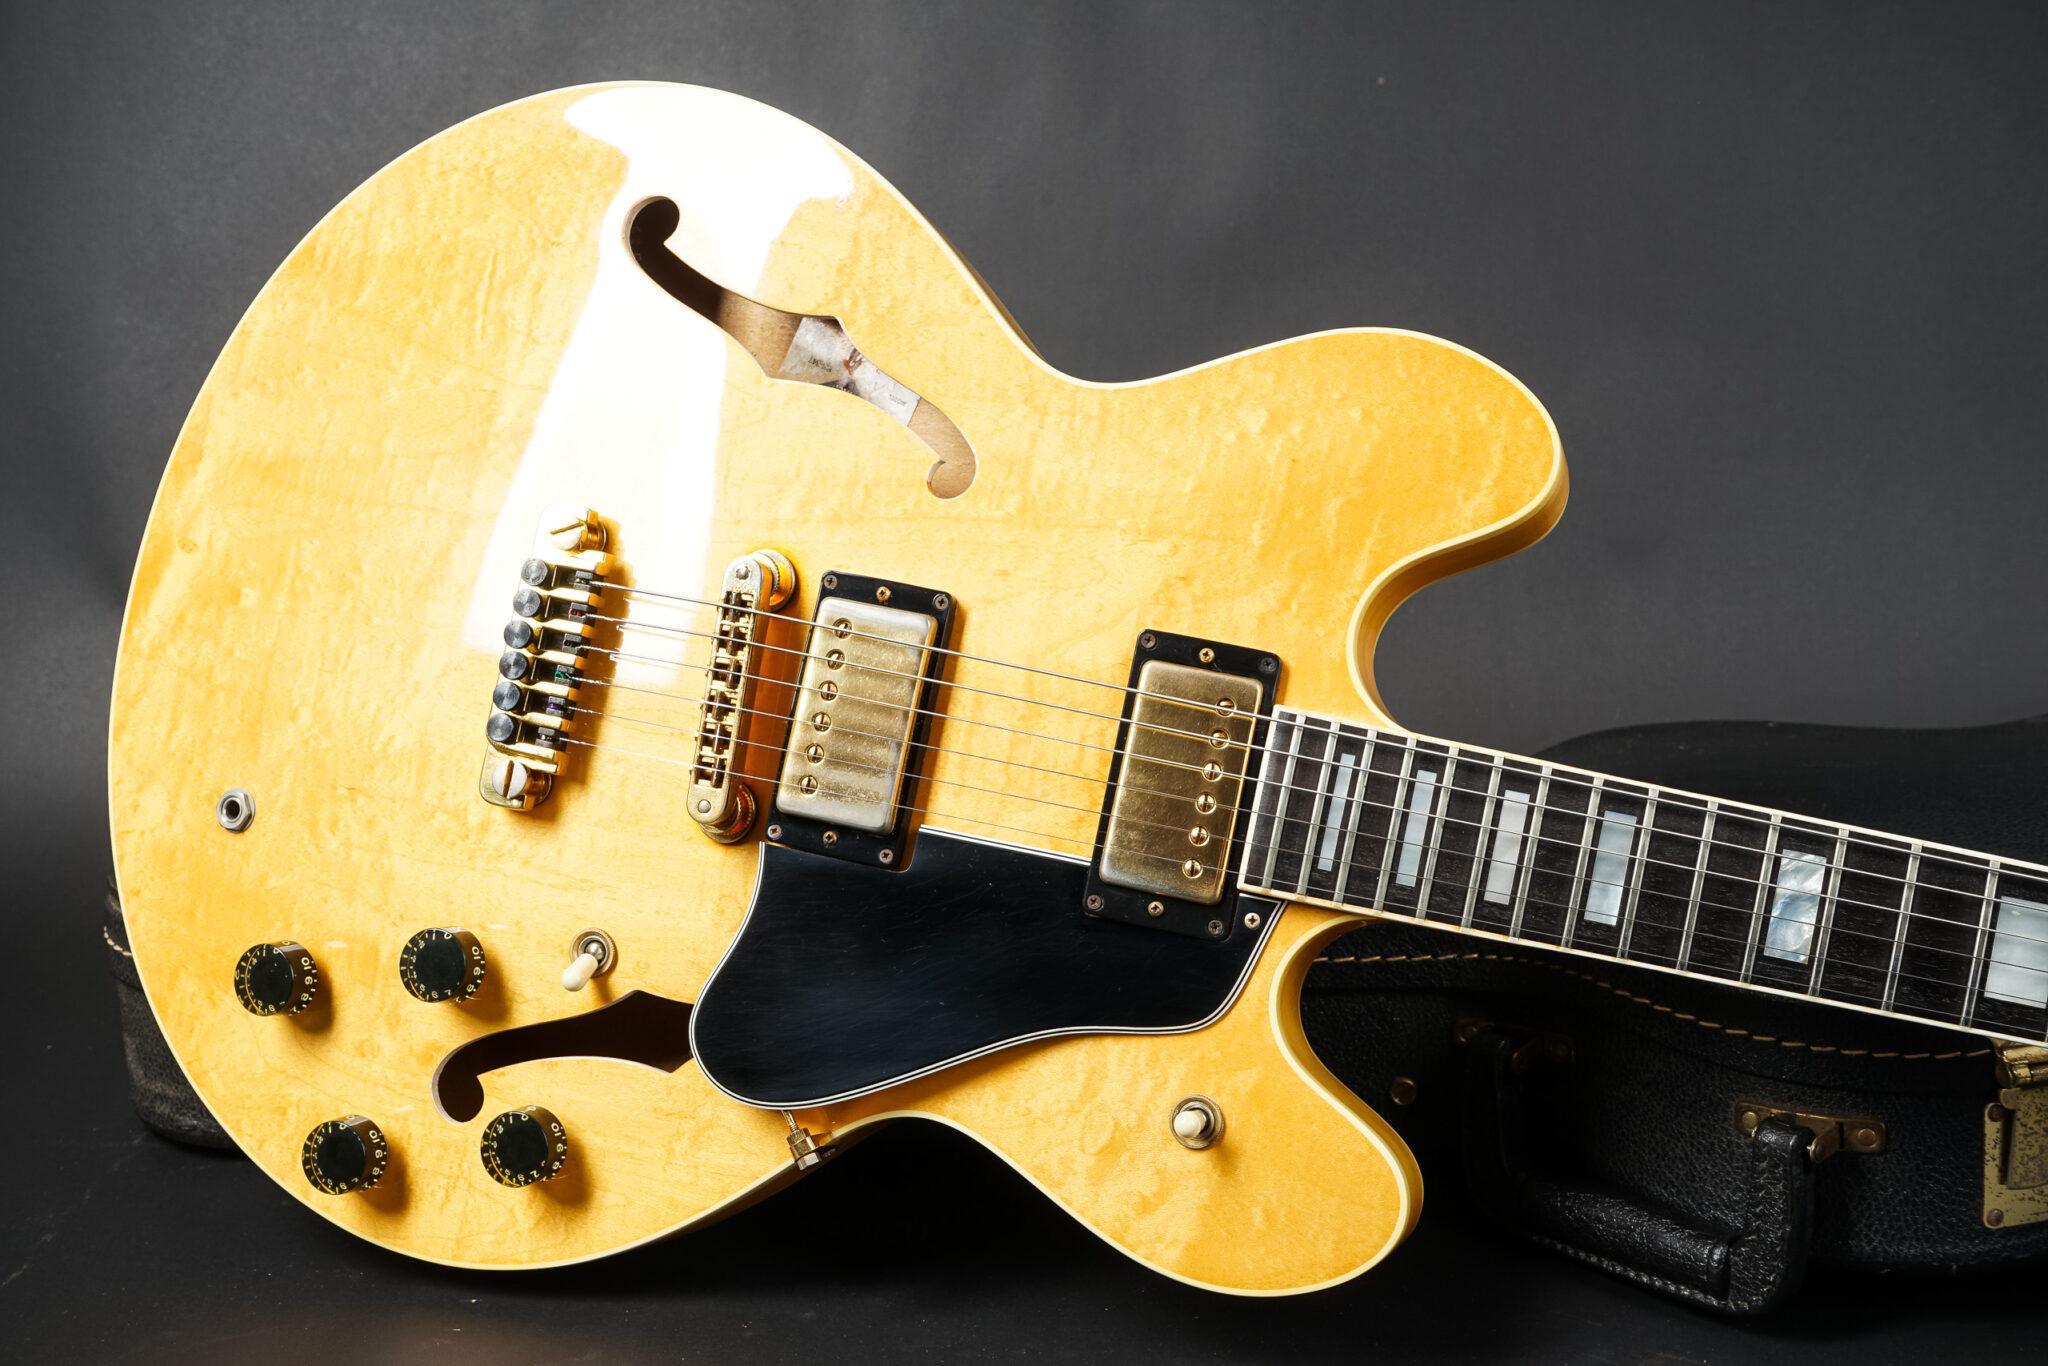 https://guitarpoint.de/app/uploads/products/1981-gibson-es-347-tdn-natural/1981-Gibson-ES-347TDN-80161004-7-2048x1366.jpg